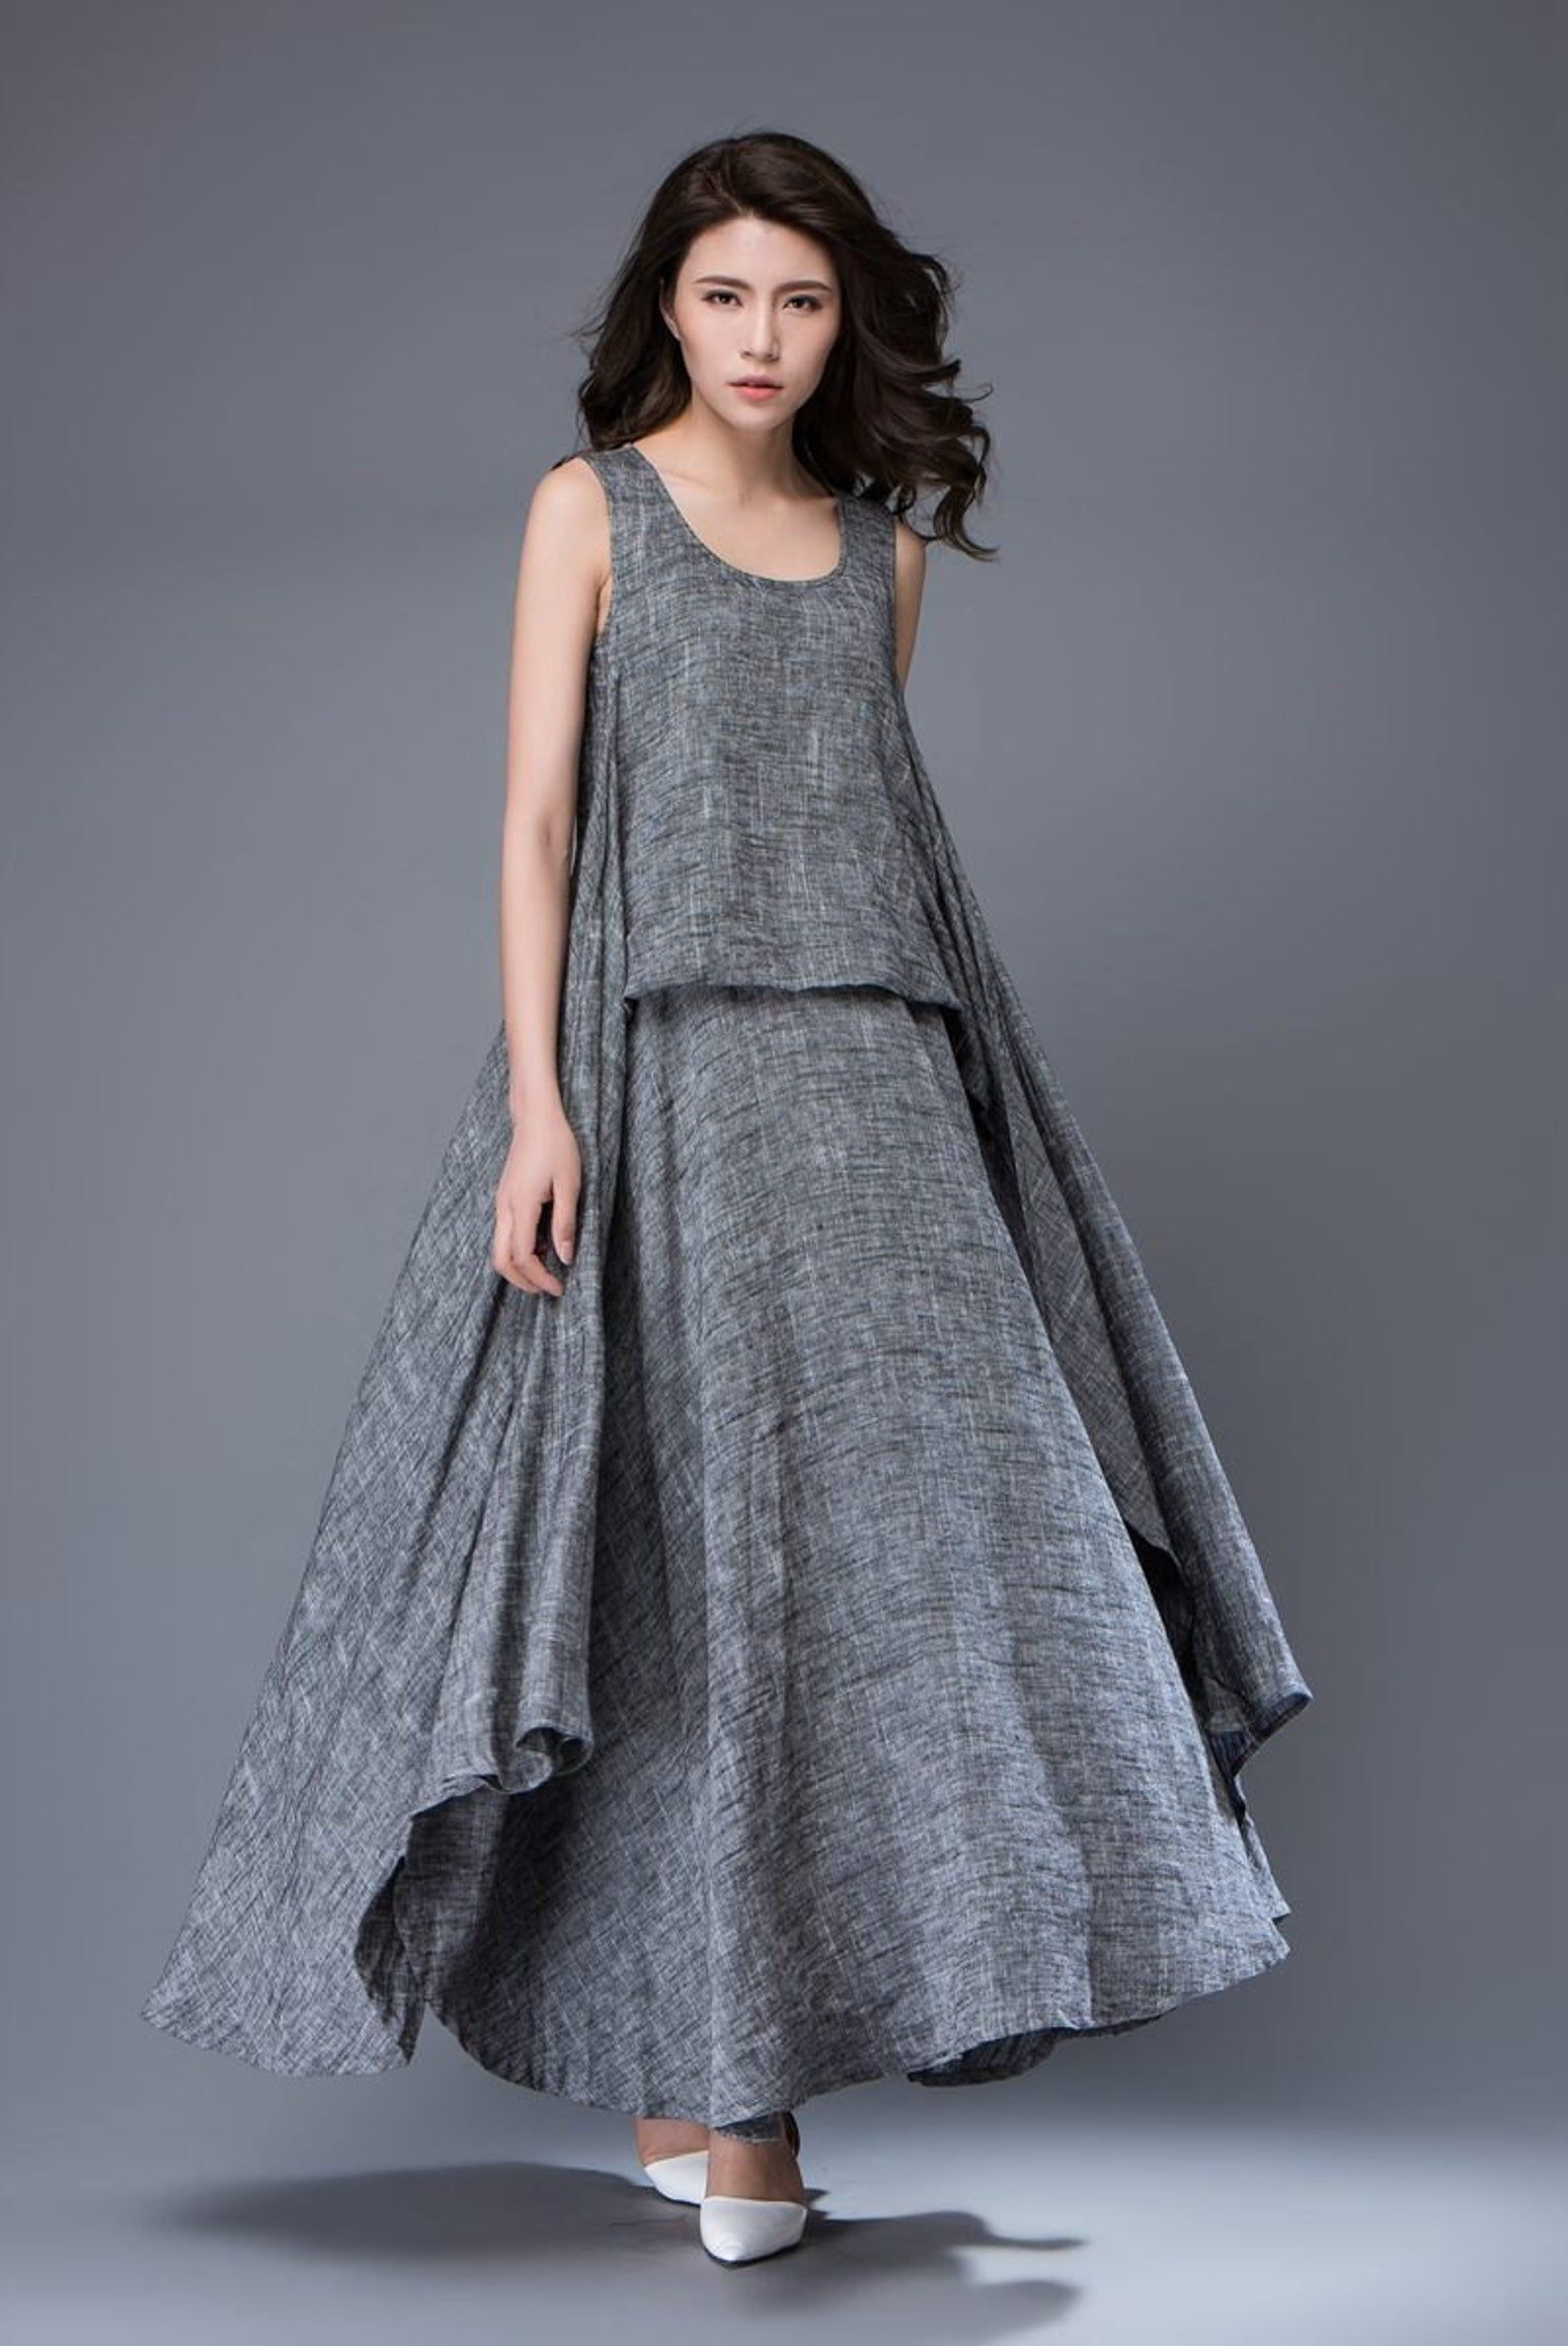 Gray Linen Dress – Layered Flowing Elegant Long Sleeve Long Summer Dress with Scoop Neck Handmade Clothing C881